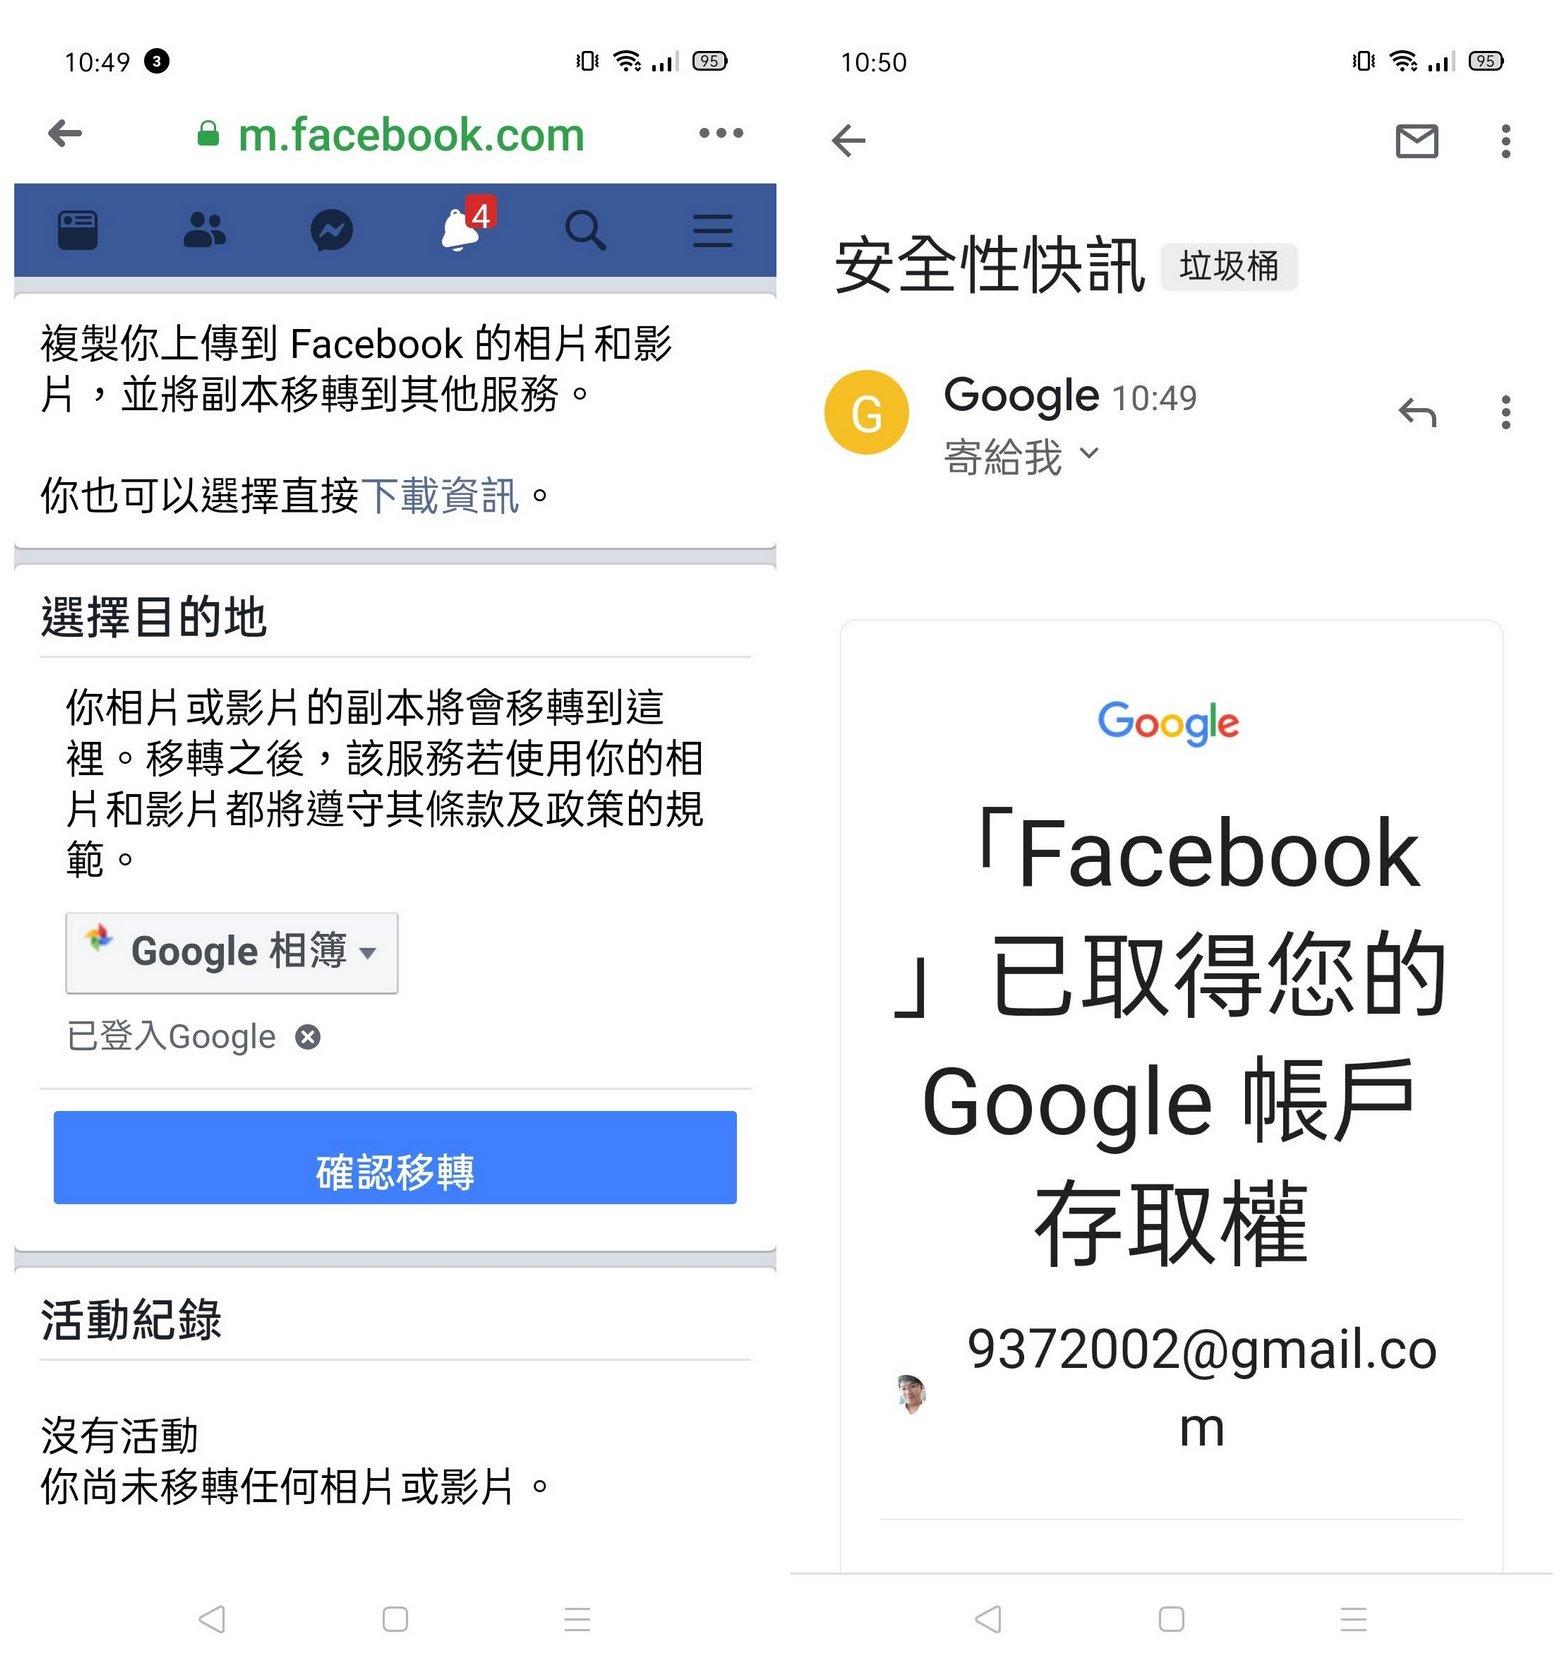 Facebook 臉書照片、影片備份到 Google相簿 儲存珍貴記憶